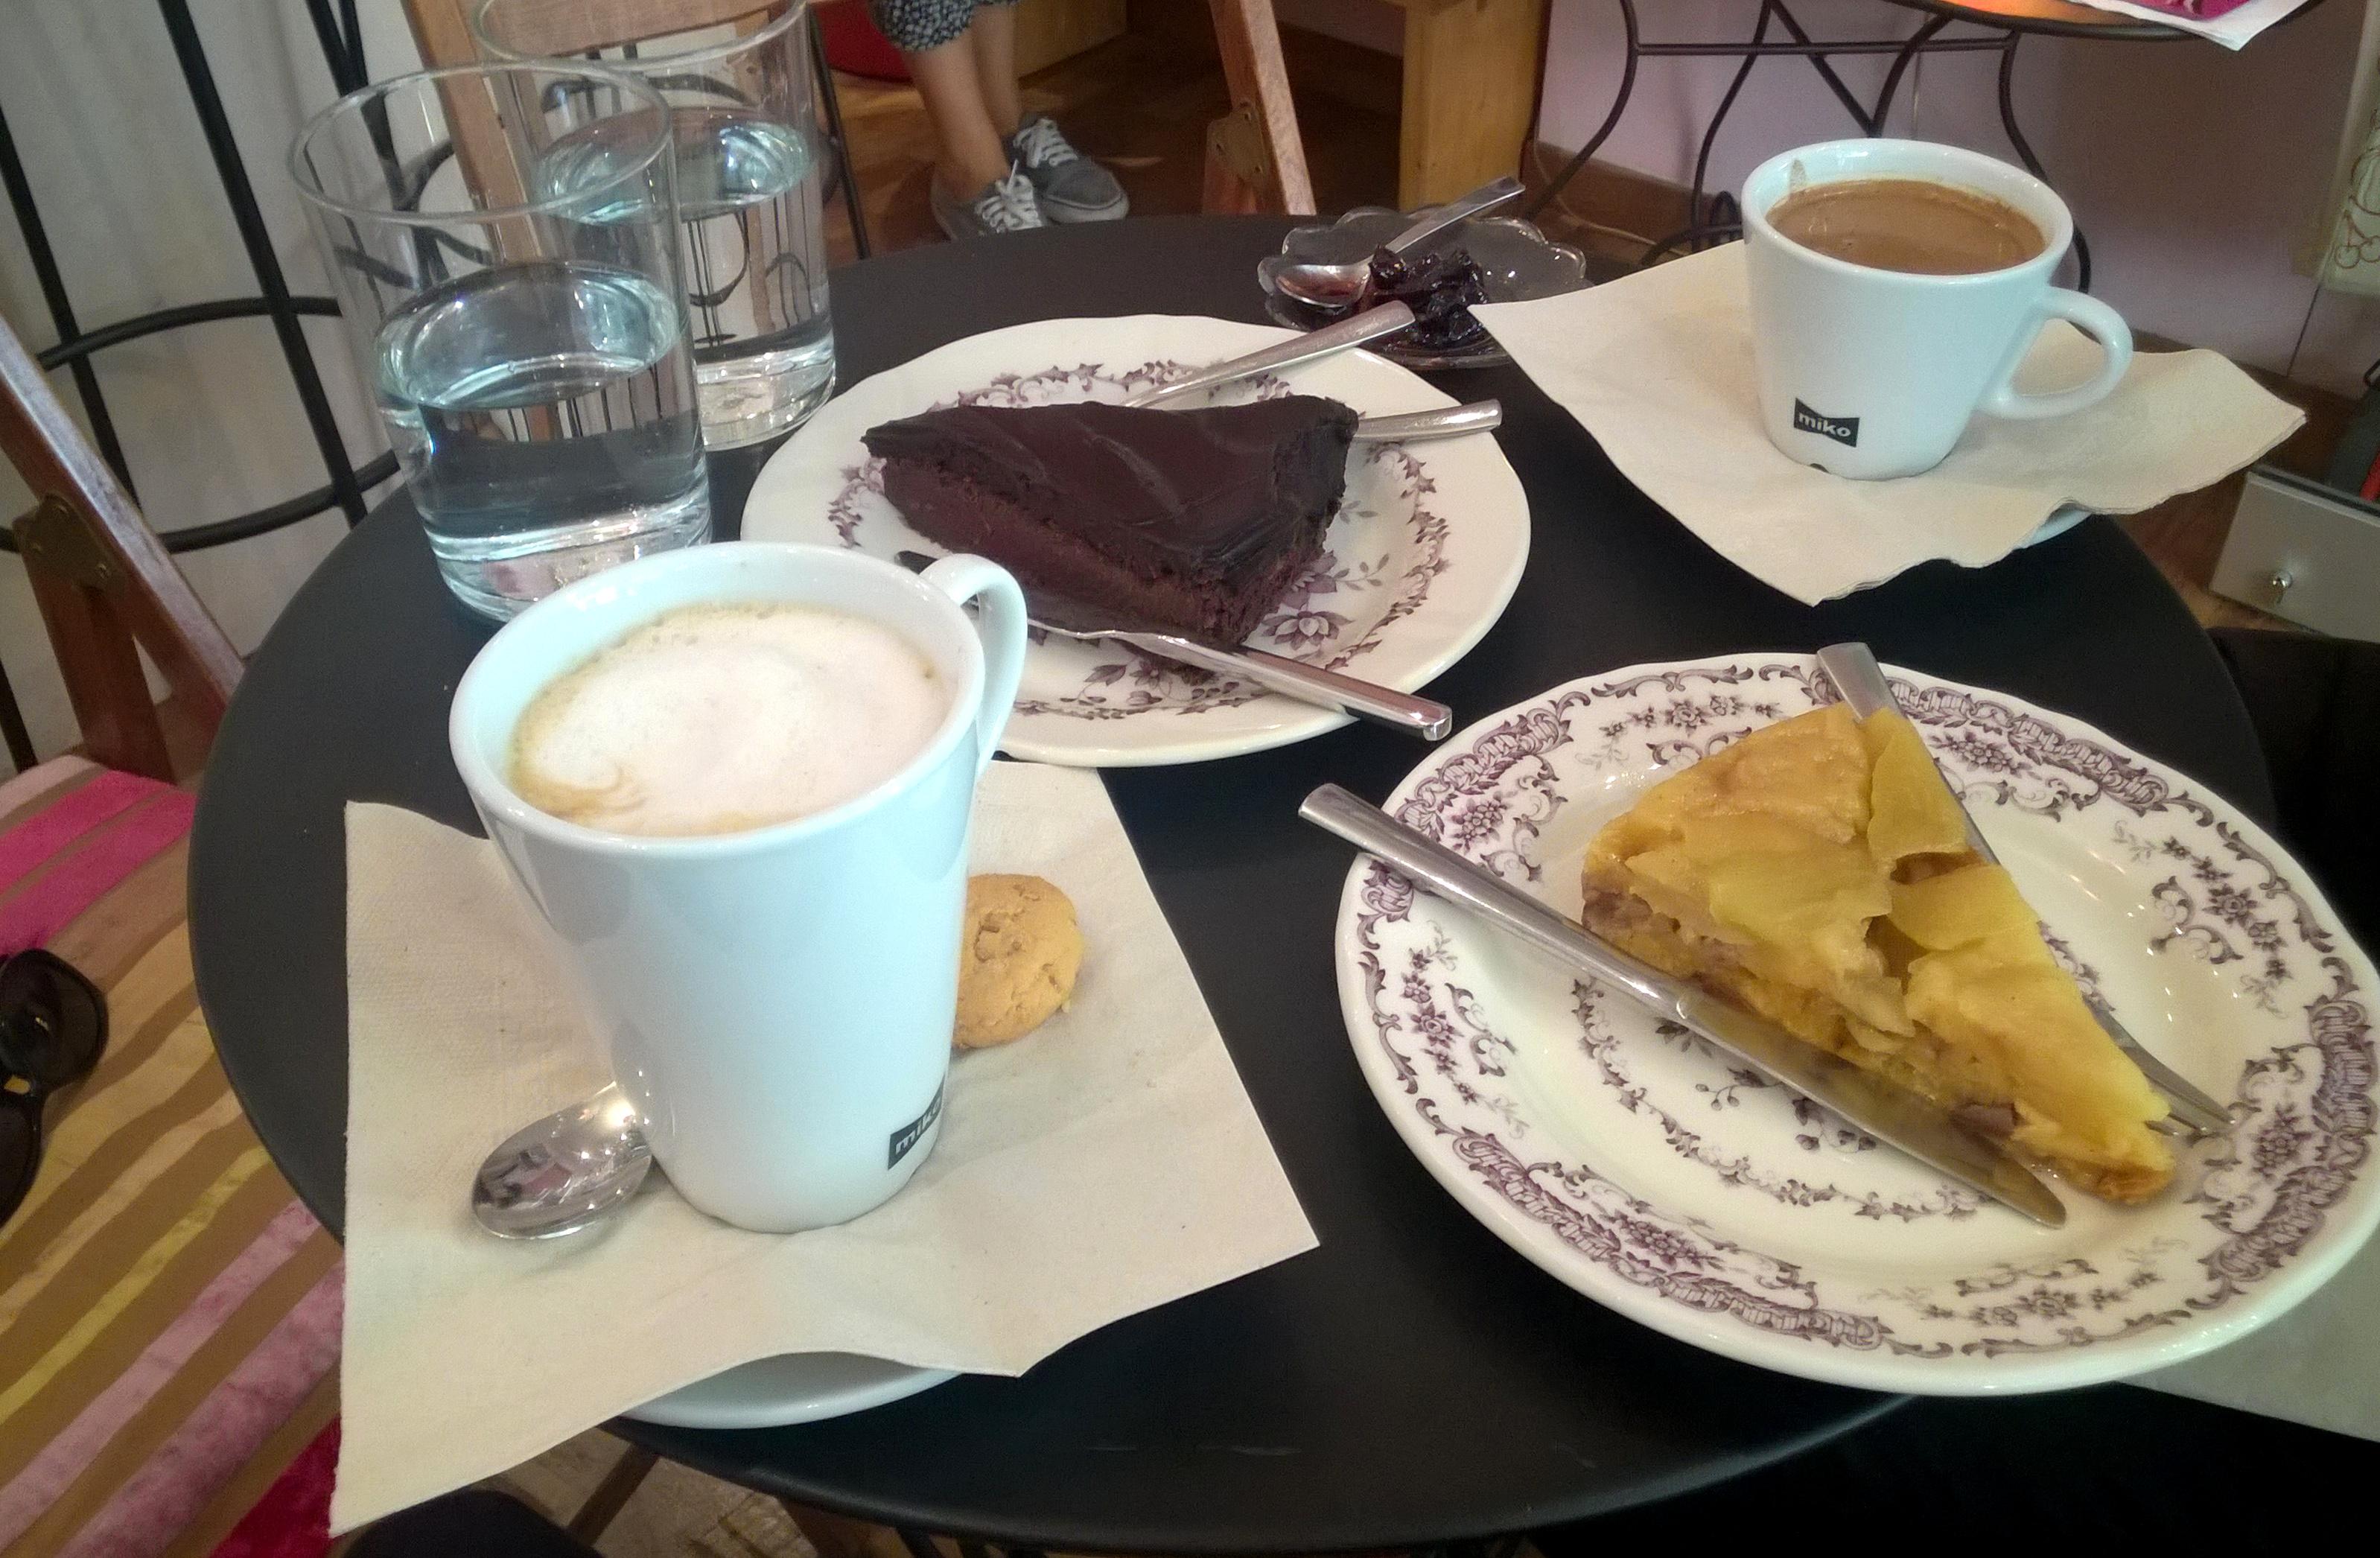 Desserts at Melikrini